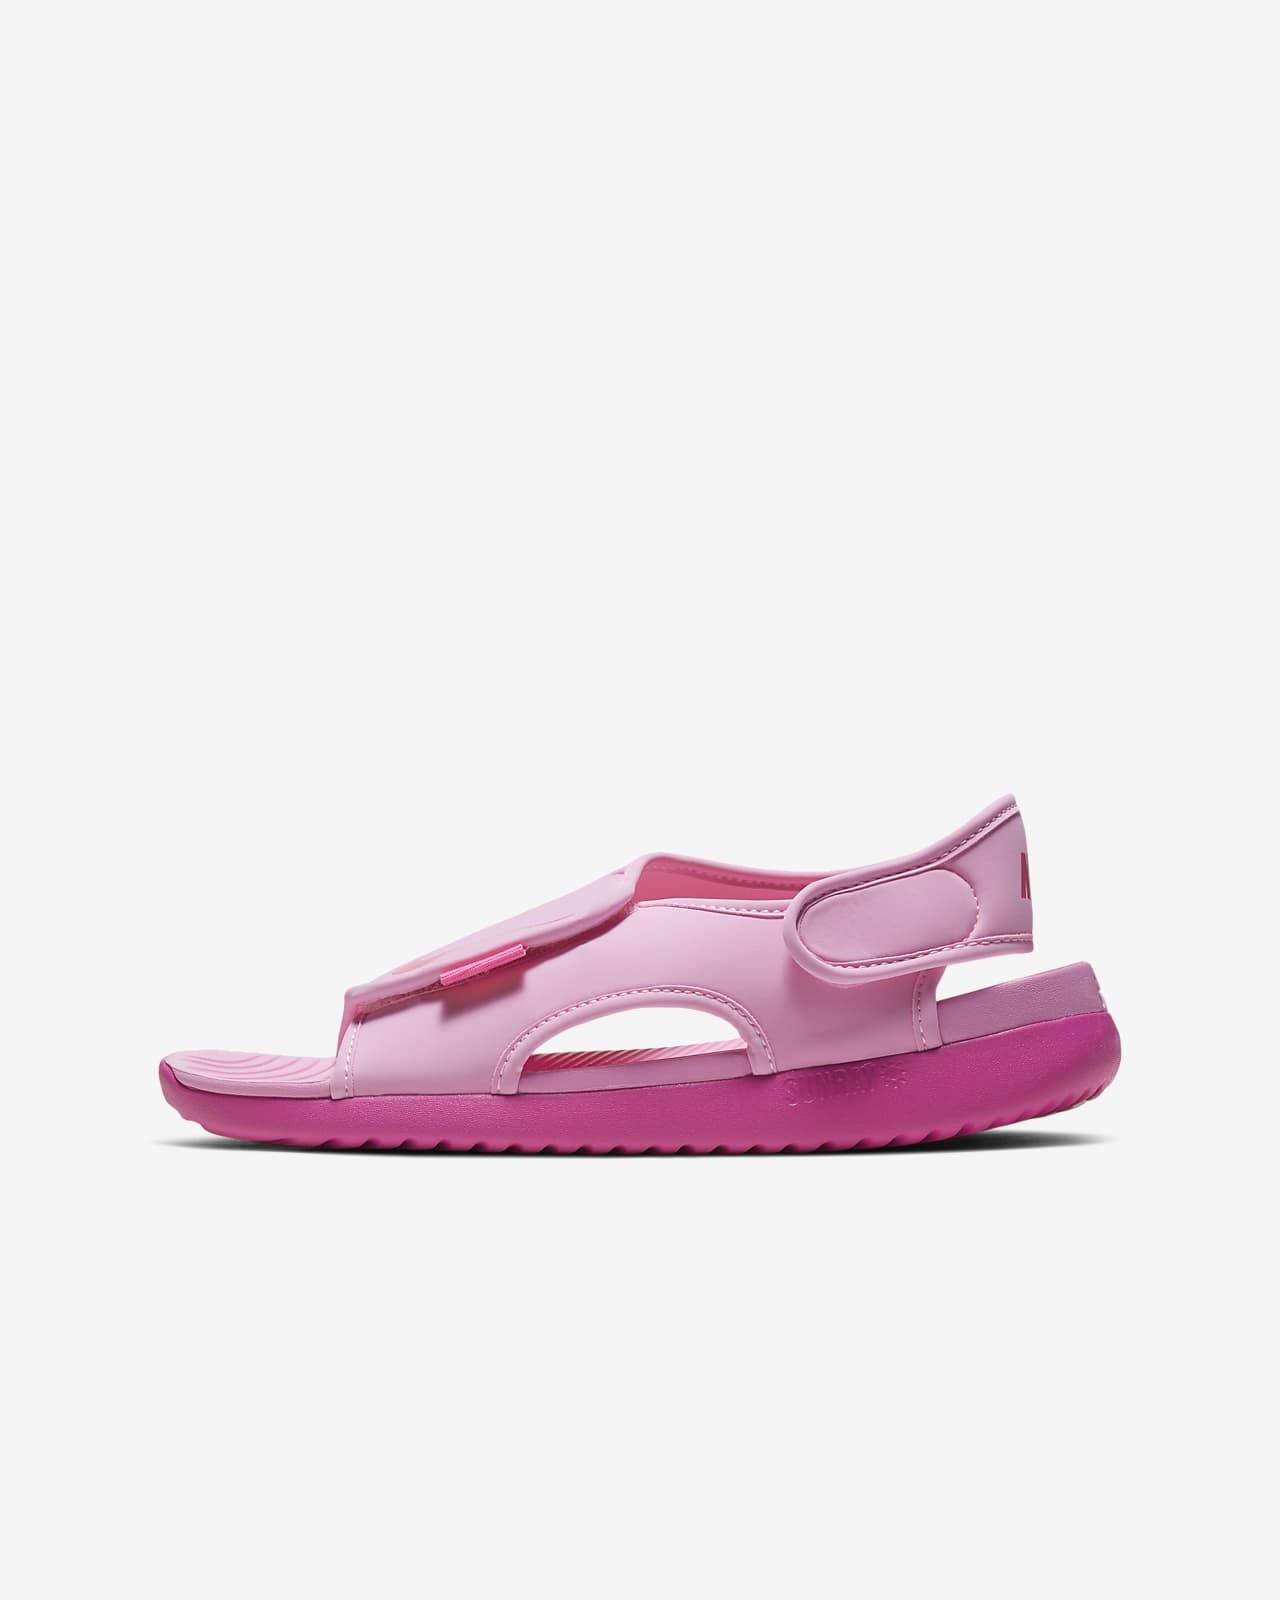 Sandalias para niños talla pequeña/grande Nike Sunray Adjust 5 V2